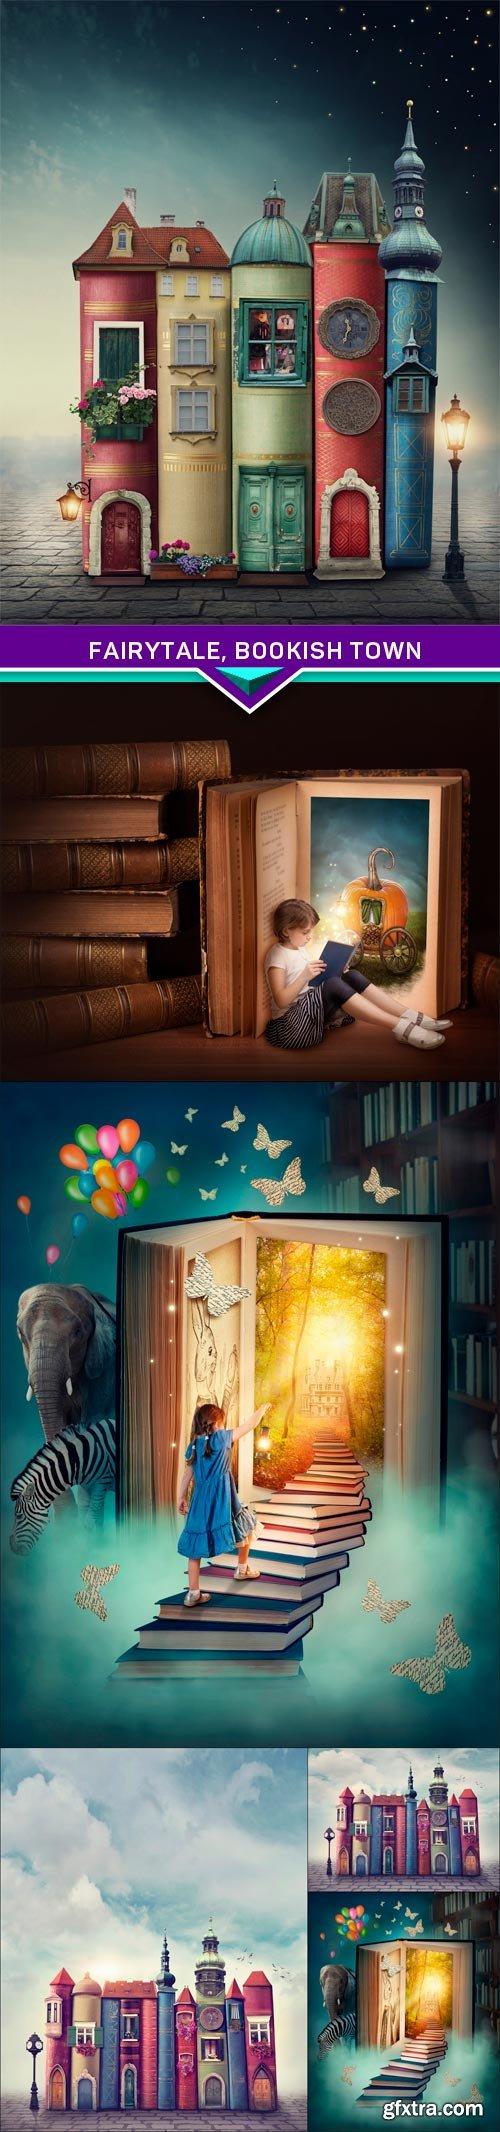 Fairytale, bookish town 6x JPEG